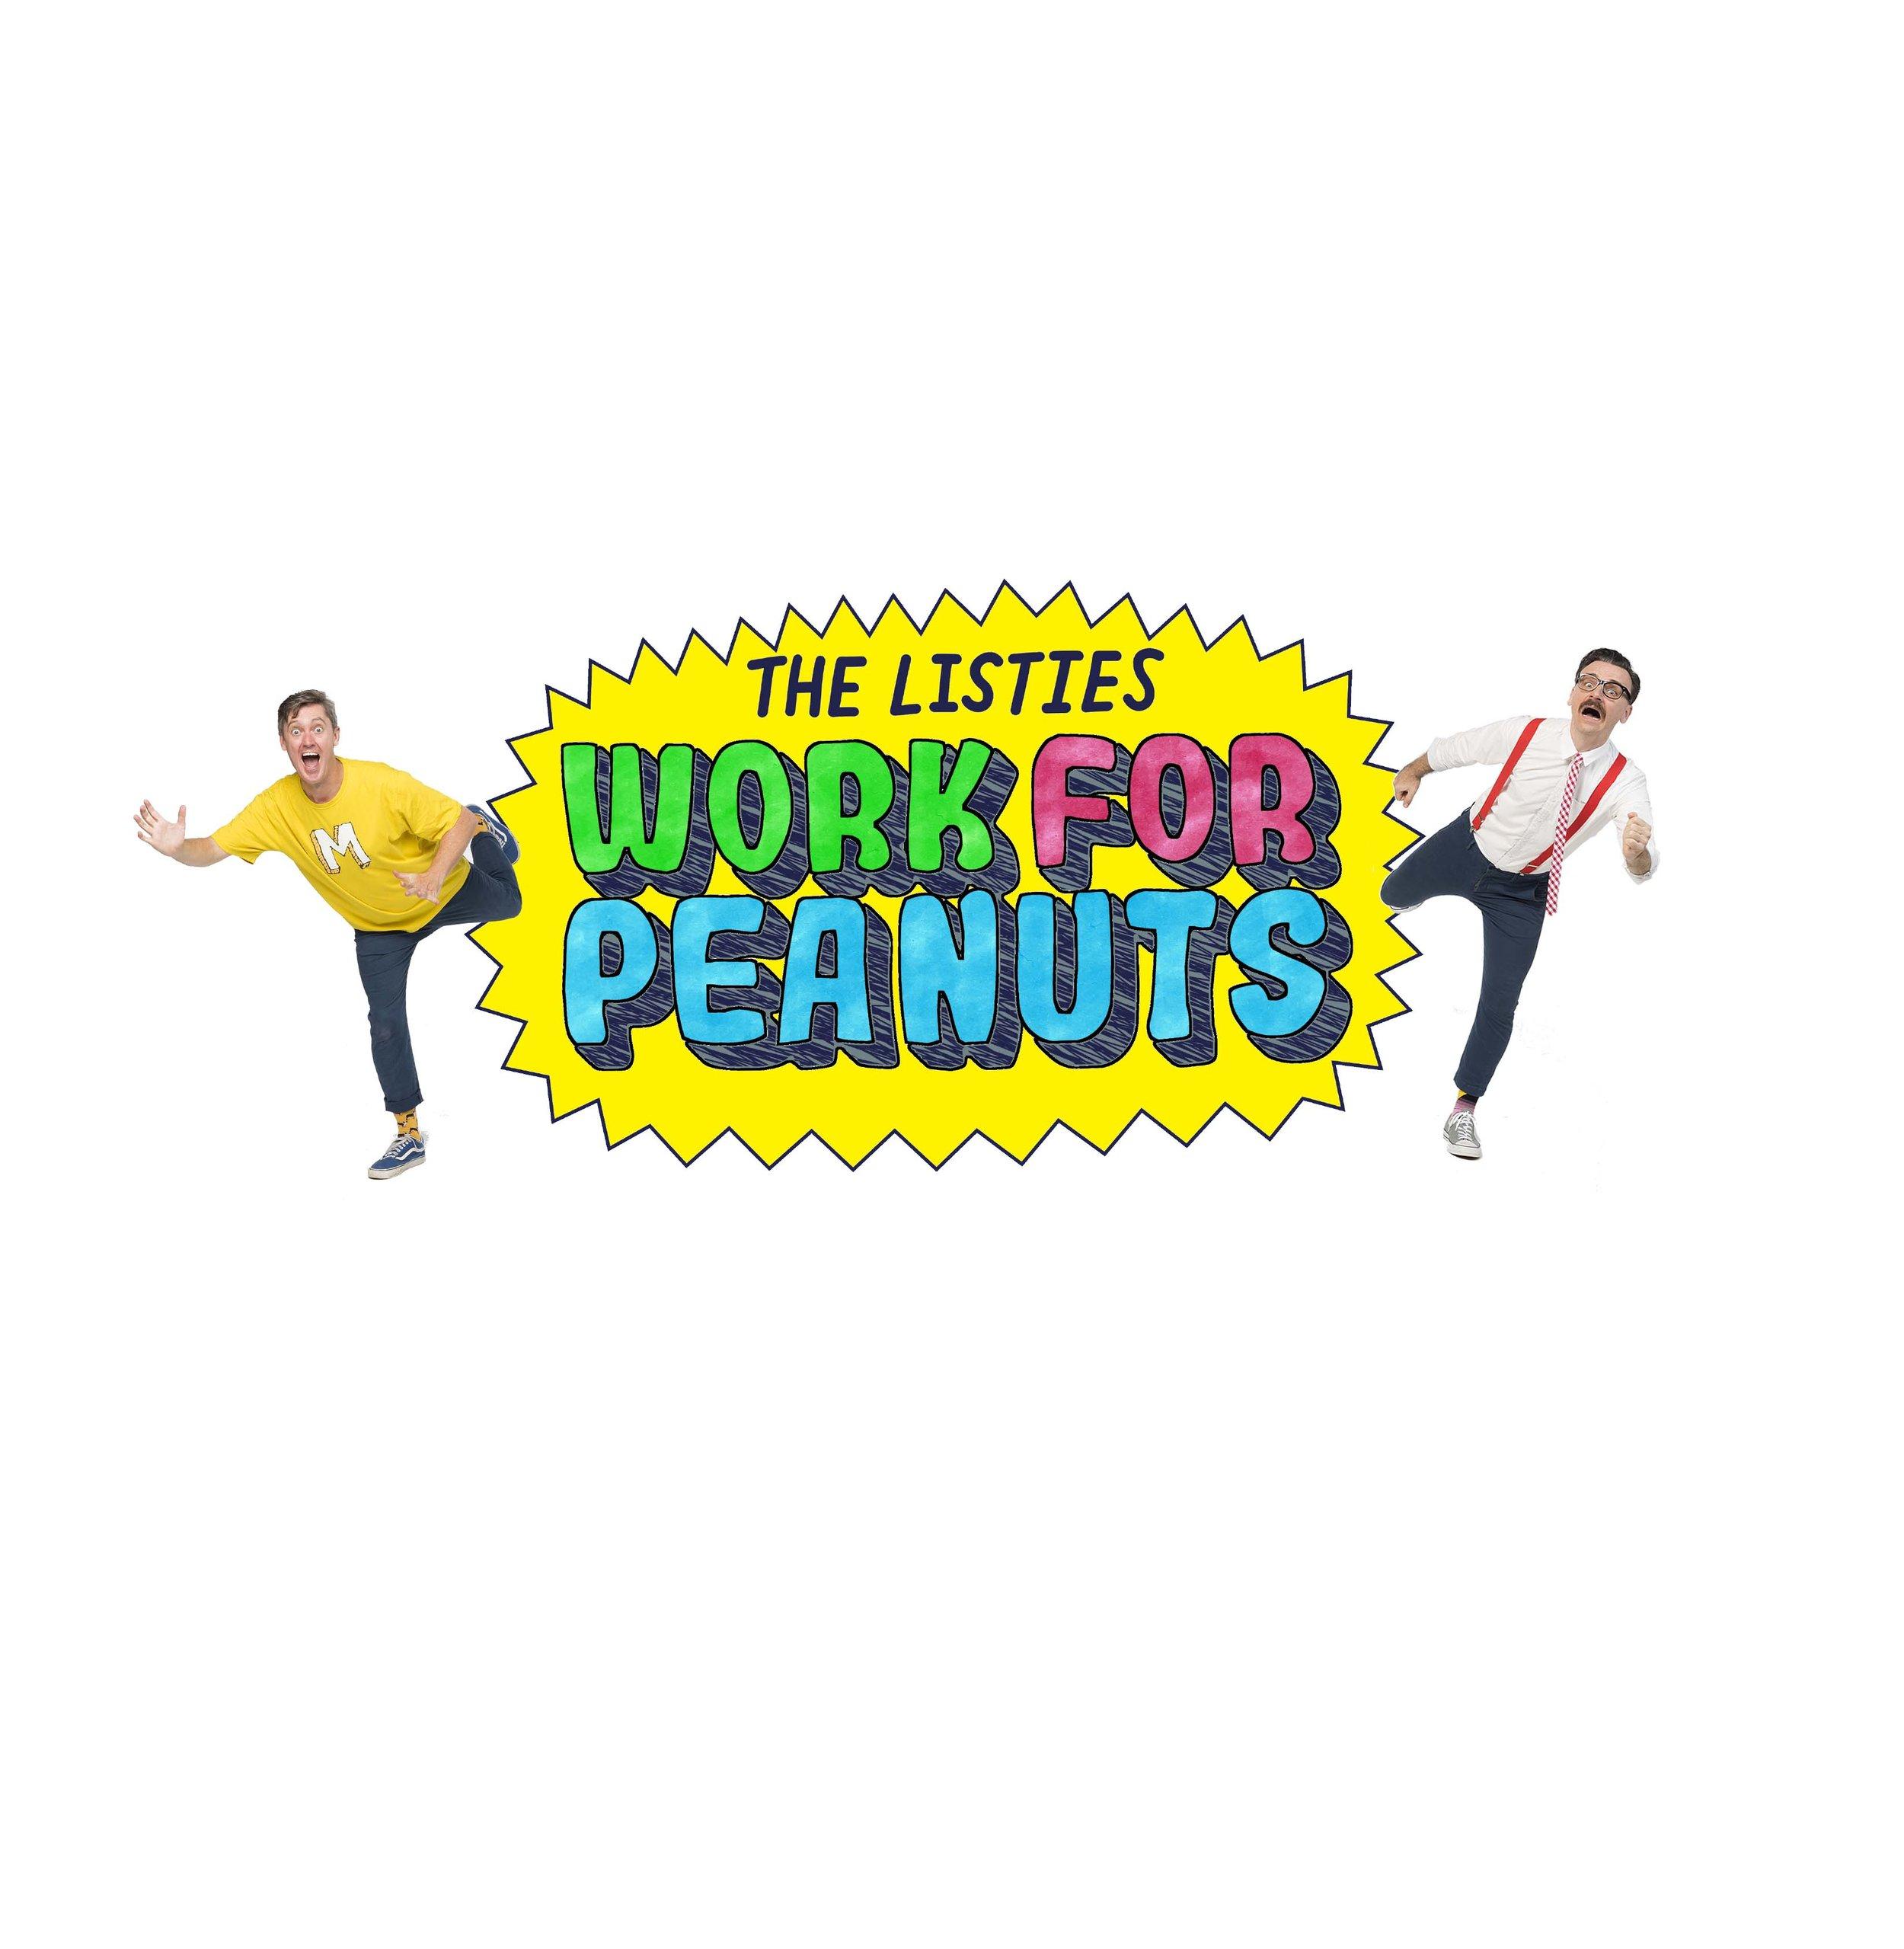 peanuts logo.jpg